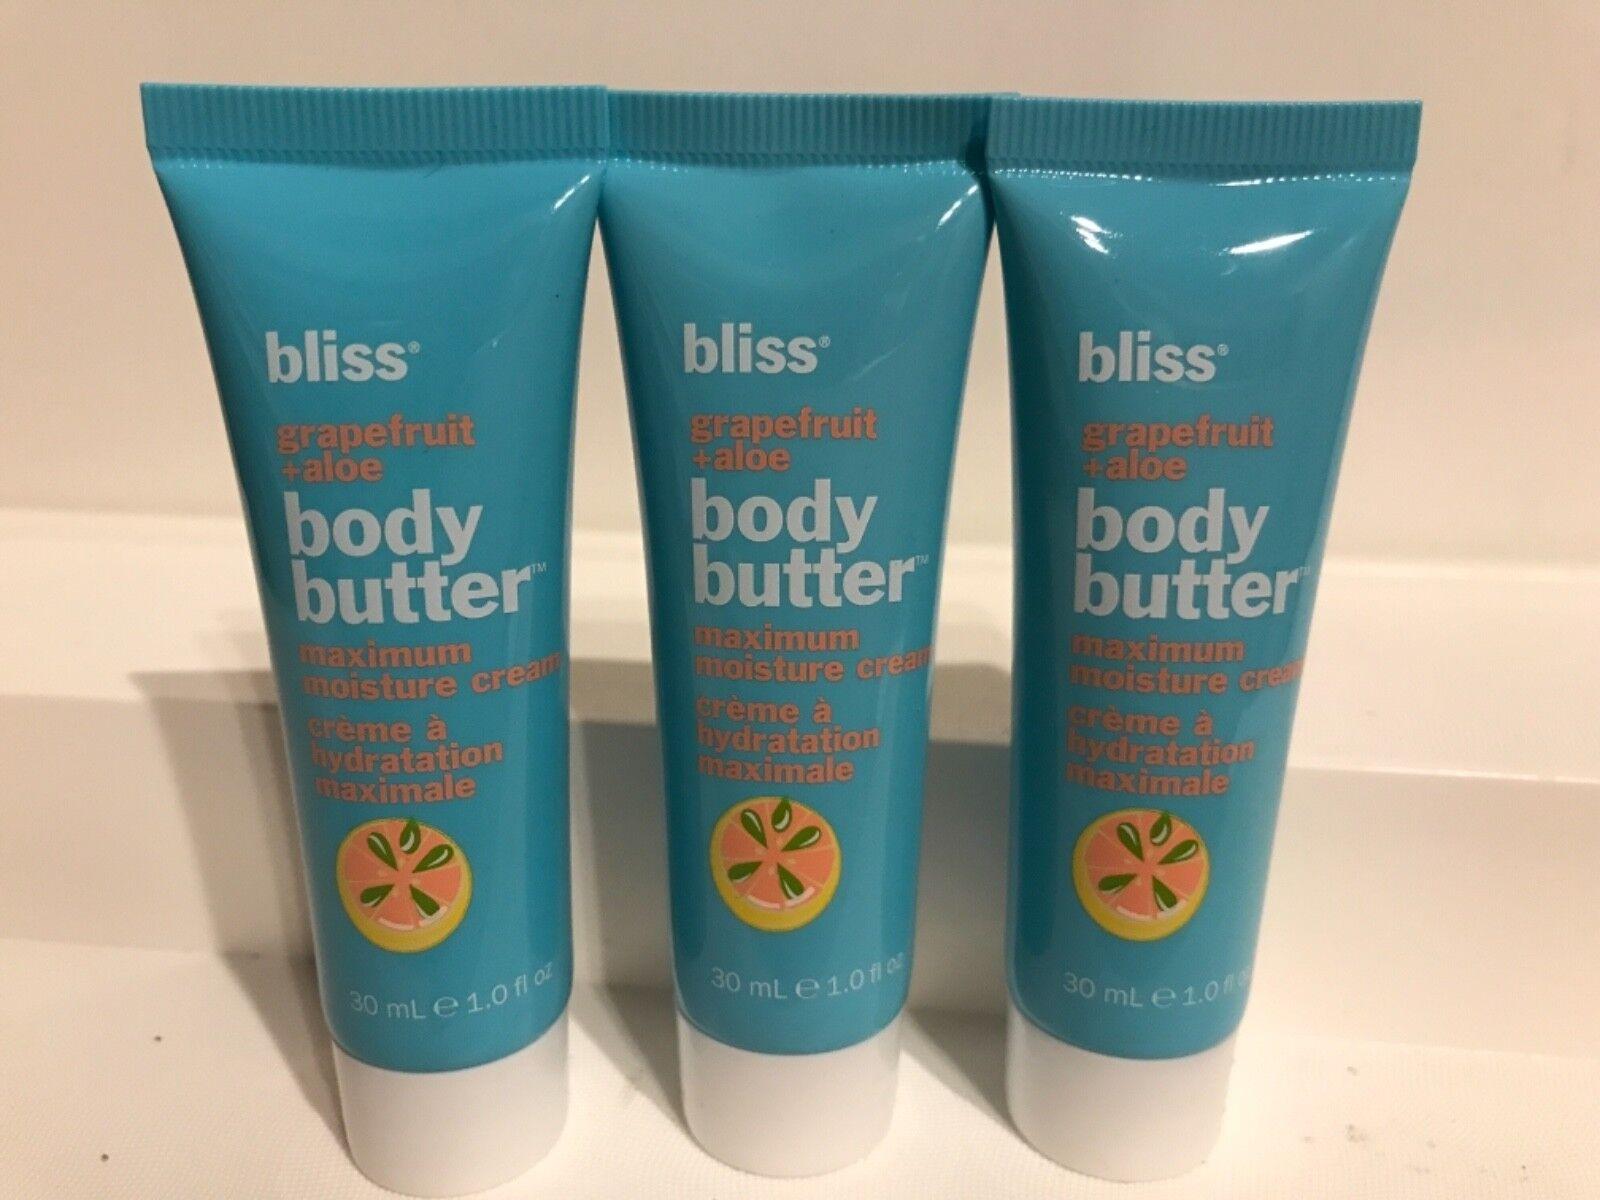 3 Bliss Body Butter Grapefruit+Aloe Maximum Moisture Cream 1